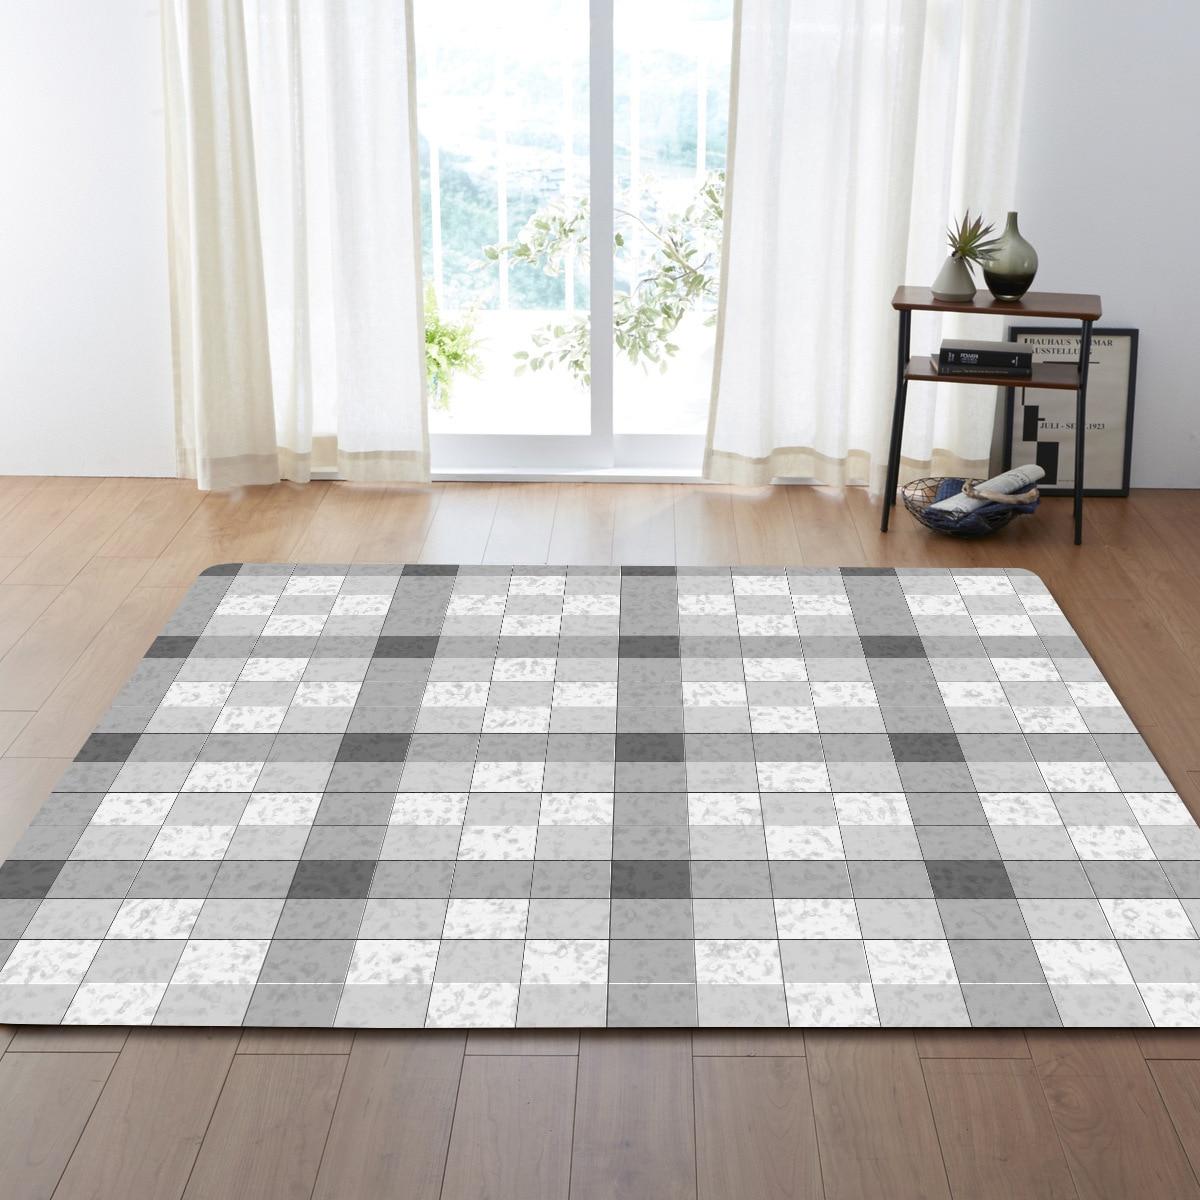 DeMissir Brief European Geometric Large Carpet For Living Room Bedroom Pad Children Pay Mat tapetes rug tapis tapete criativo